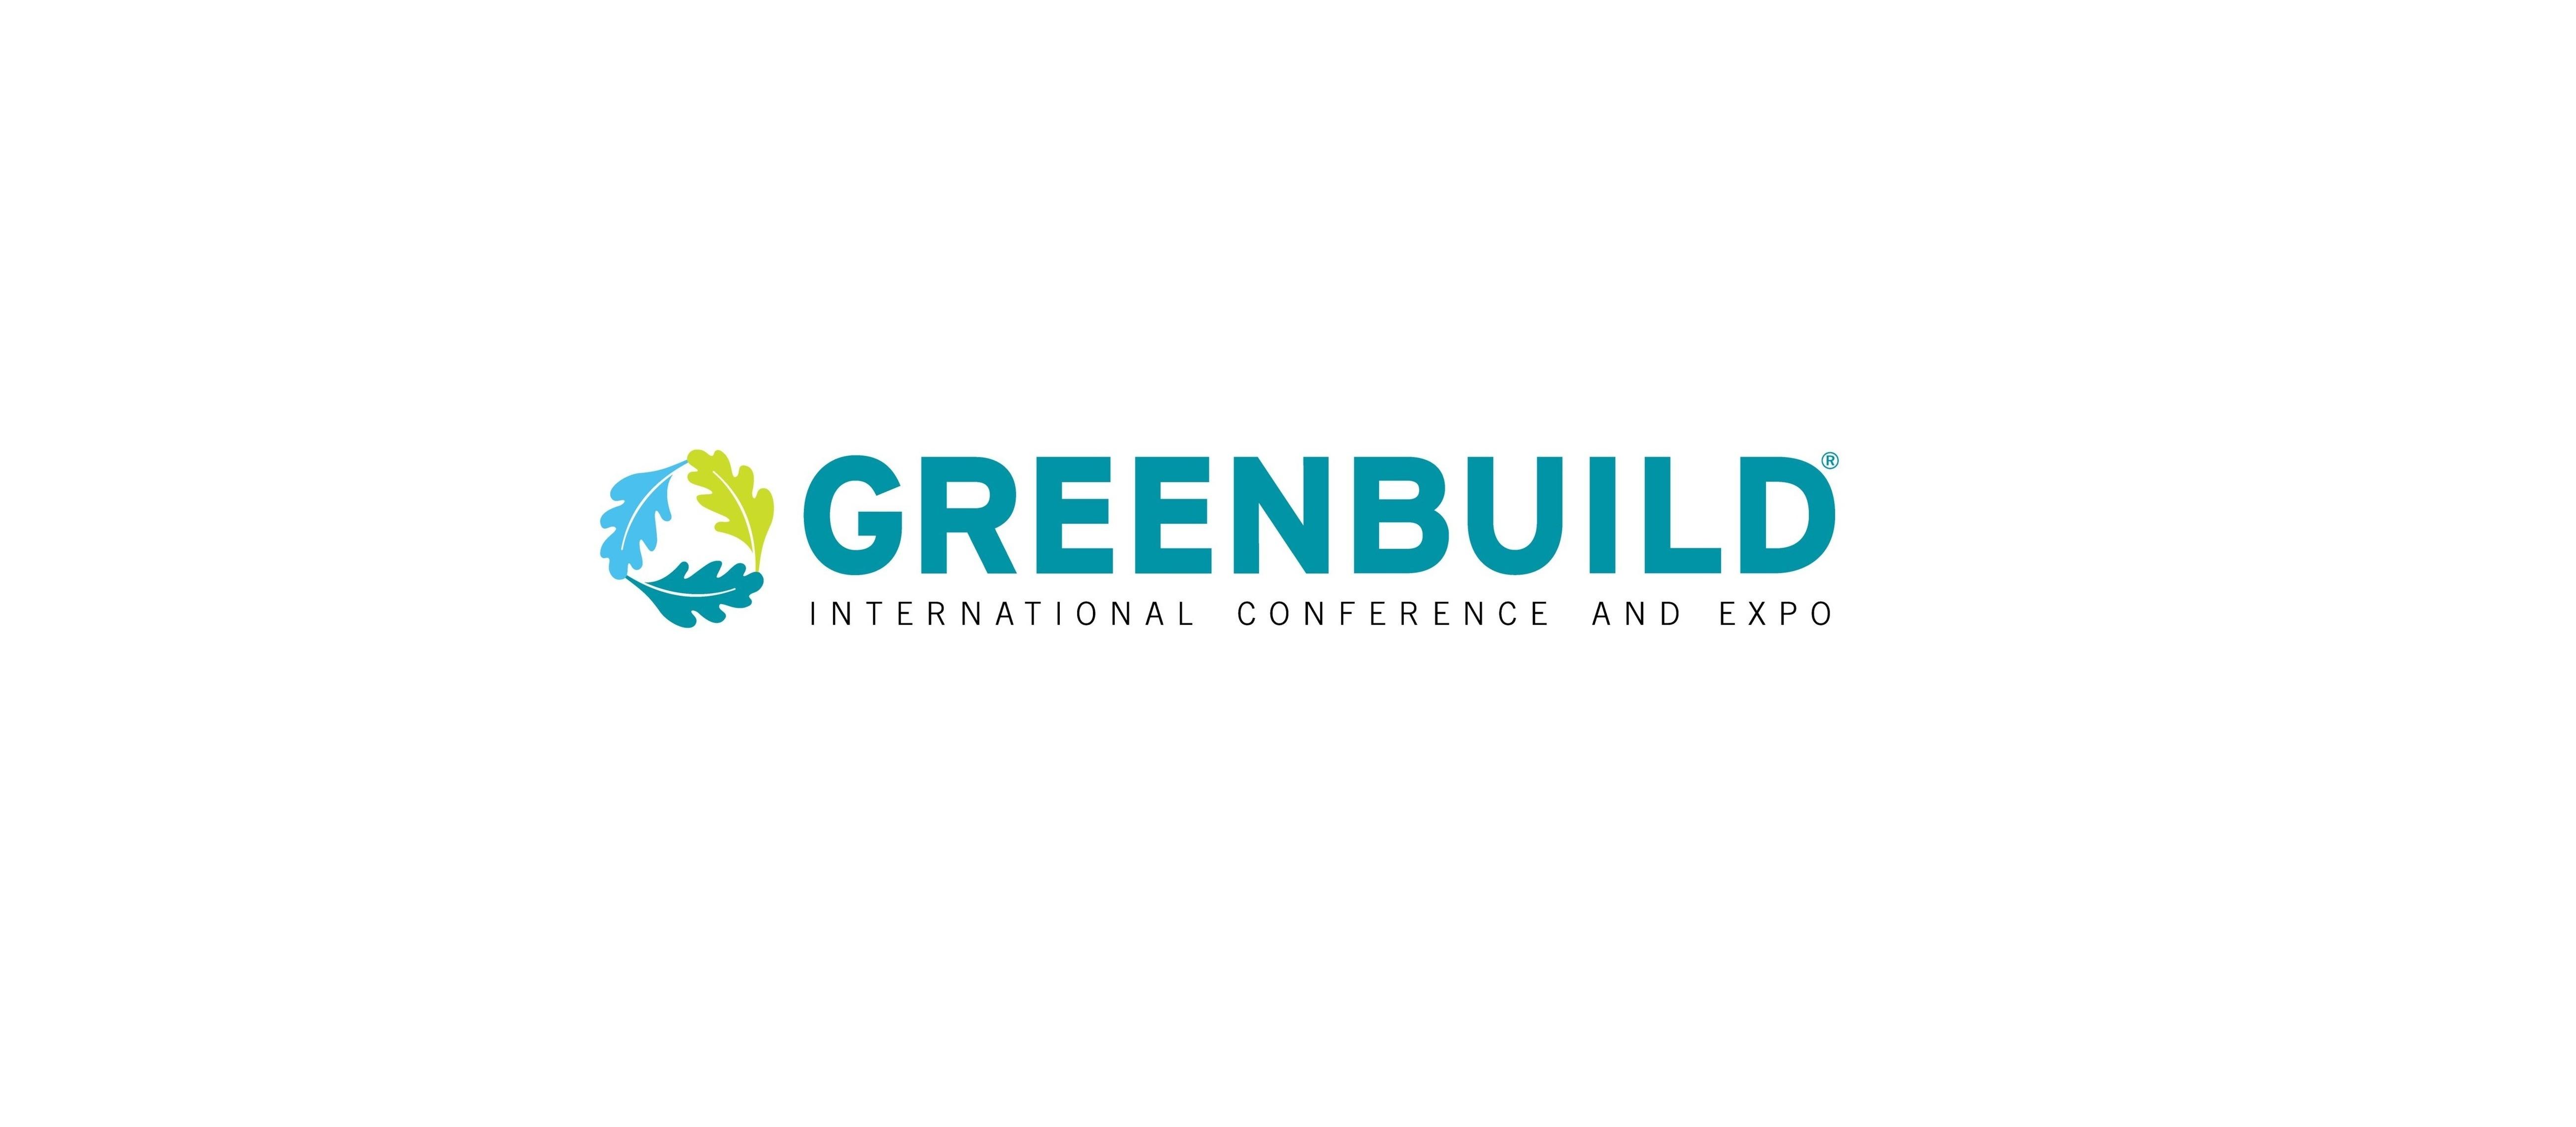 Conheça o Greenbuild International Conference and Expo